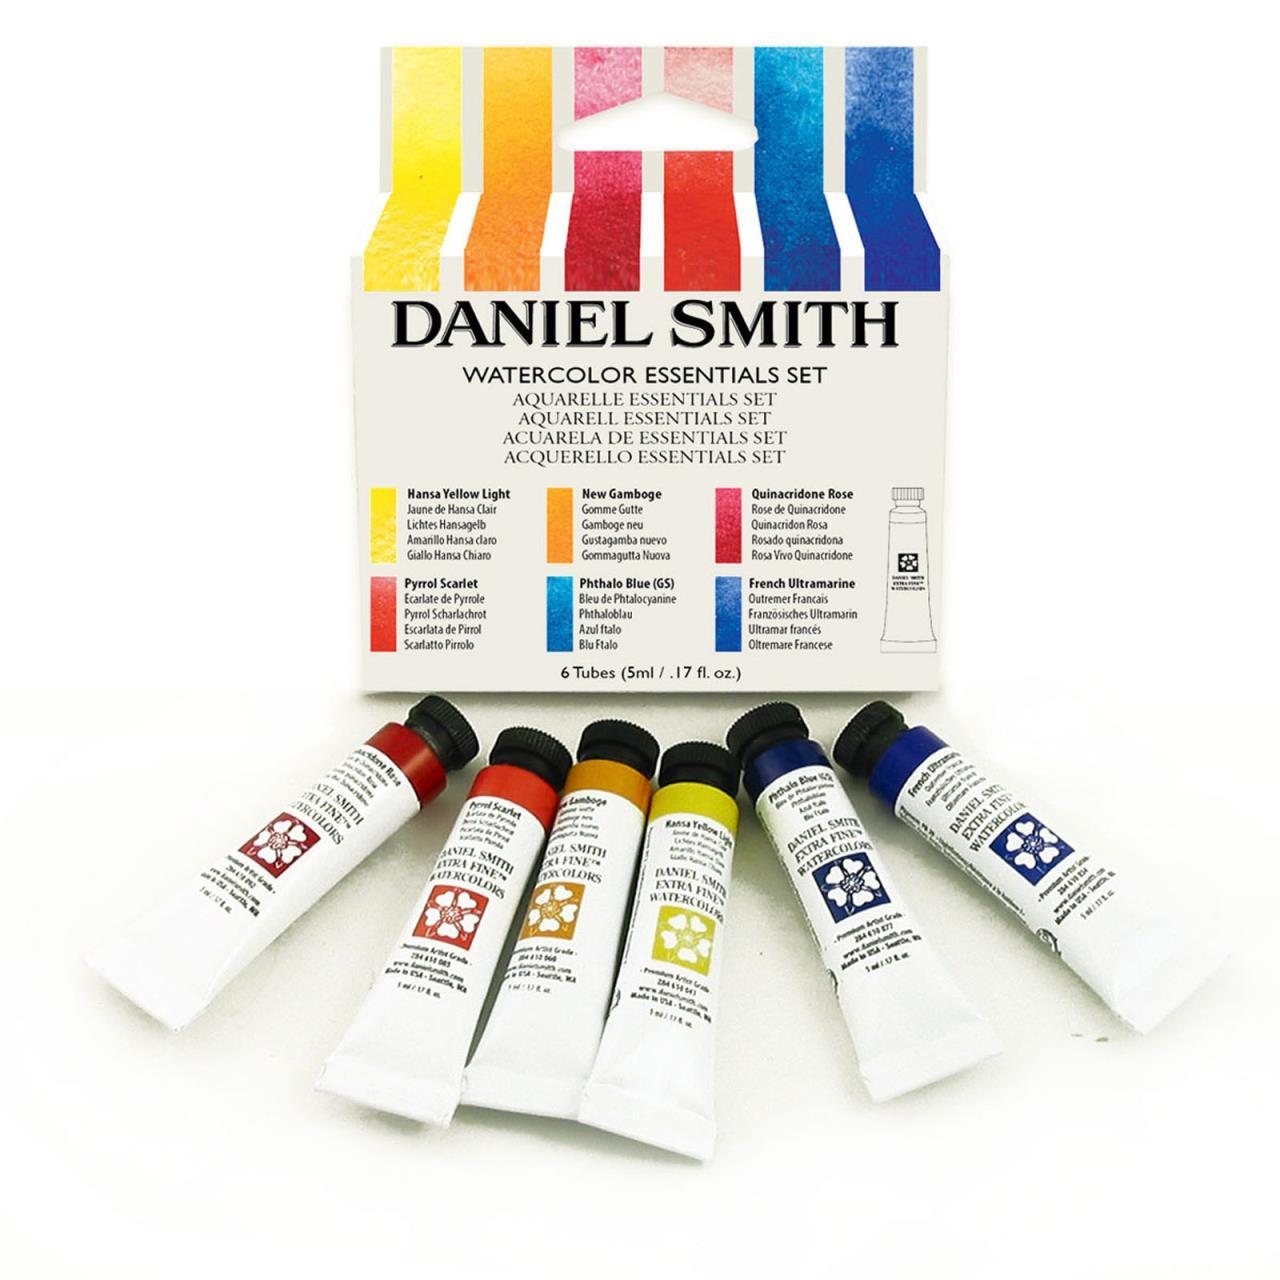 Essentials 5ml - Set of 6, DANIEL SMITH Extra Fine Watercolors -